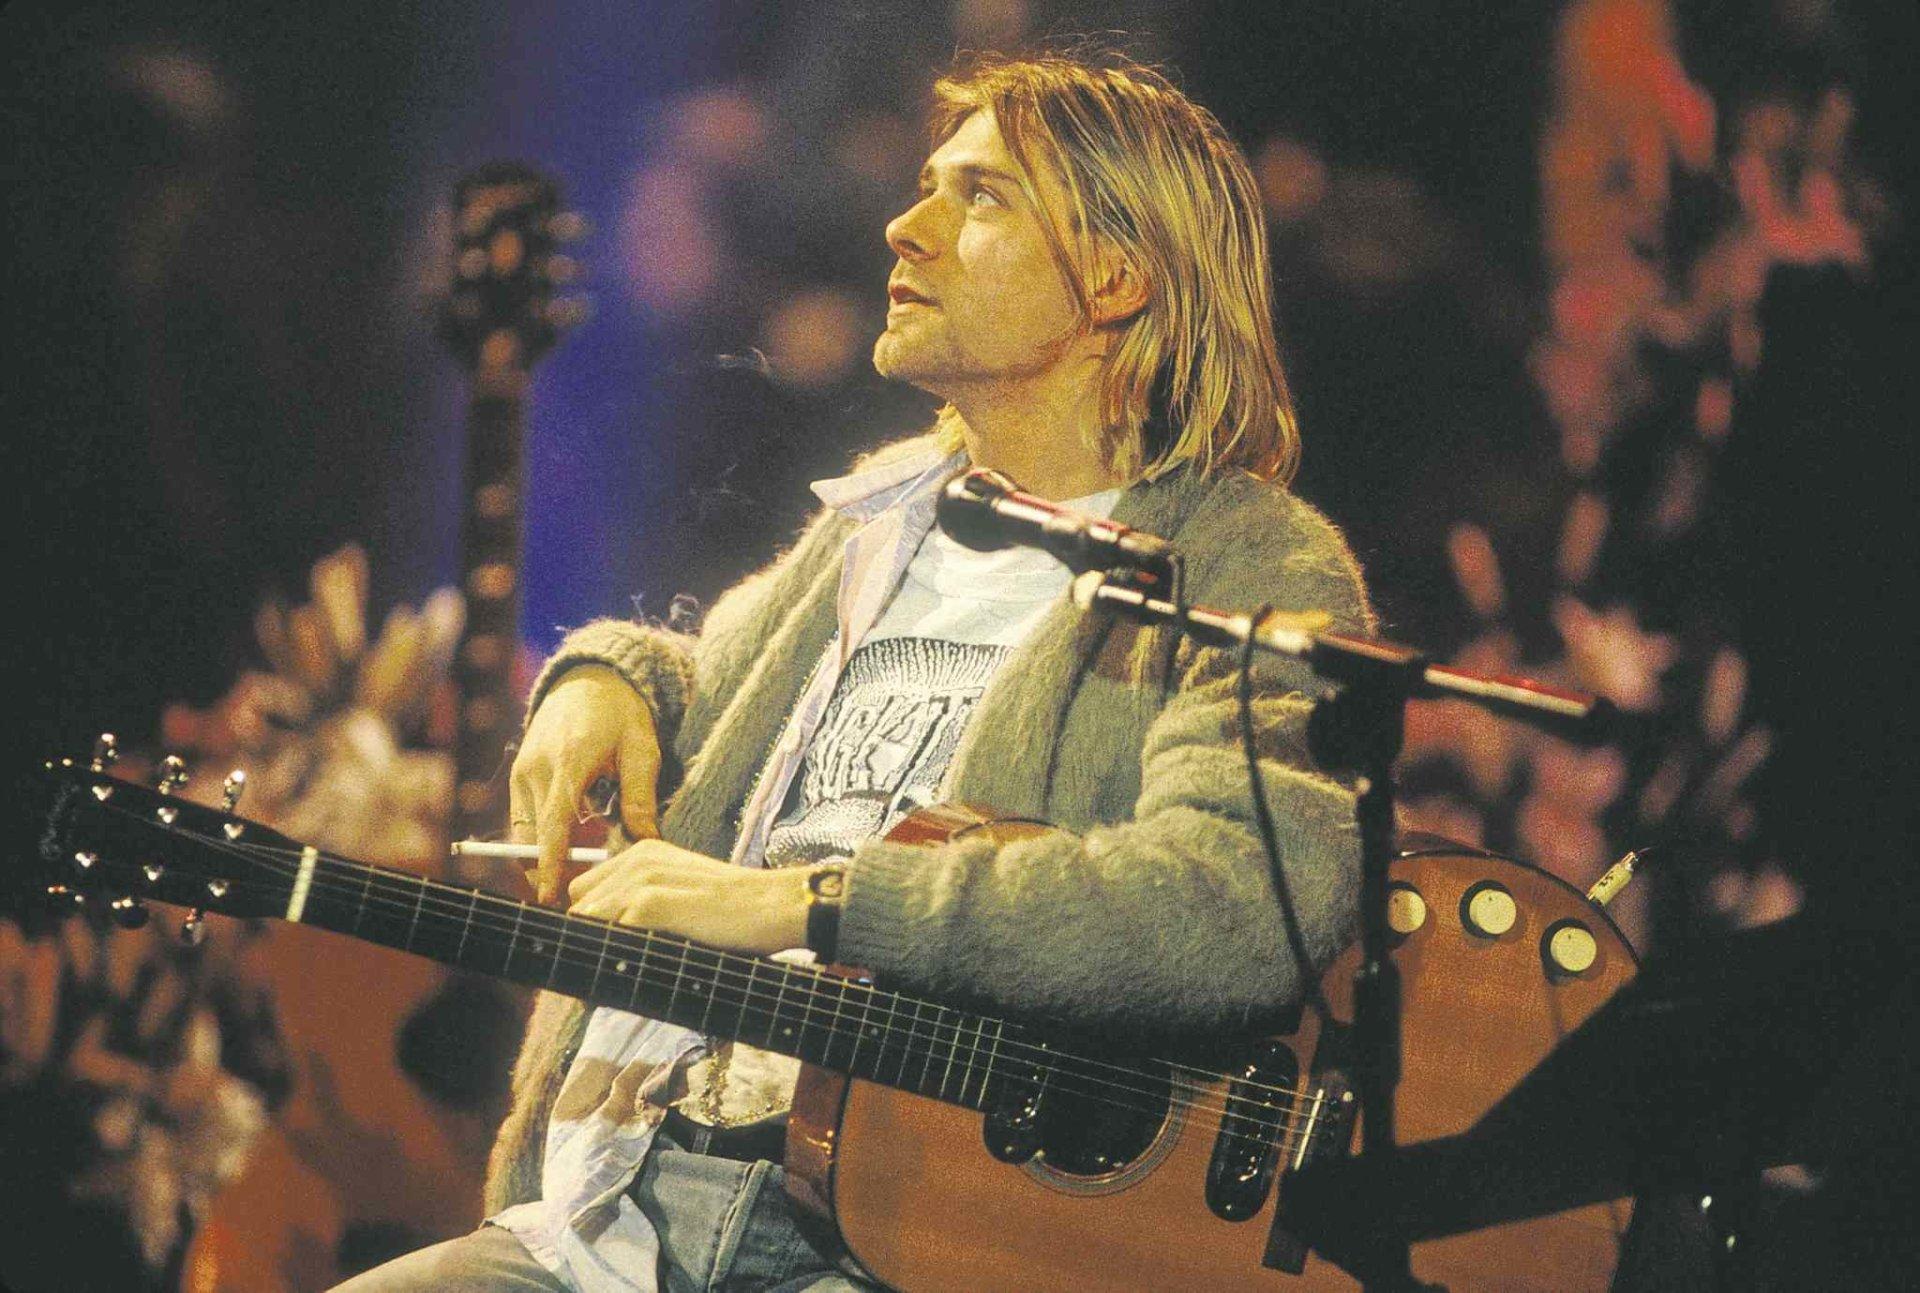 Kurt cobain hd wallpaper background image 2048x1379 - Kurt cobain nirvana wallpaper ...